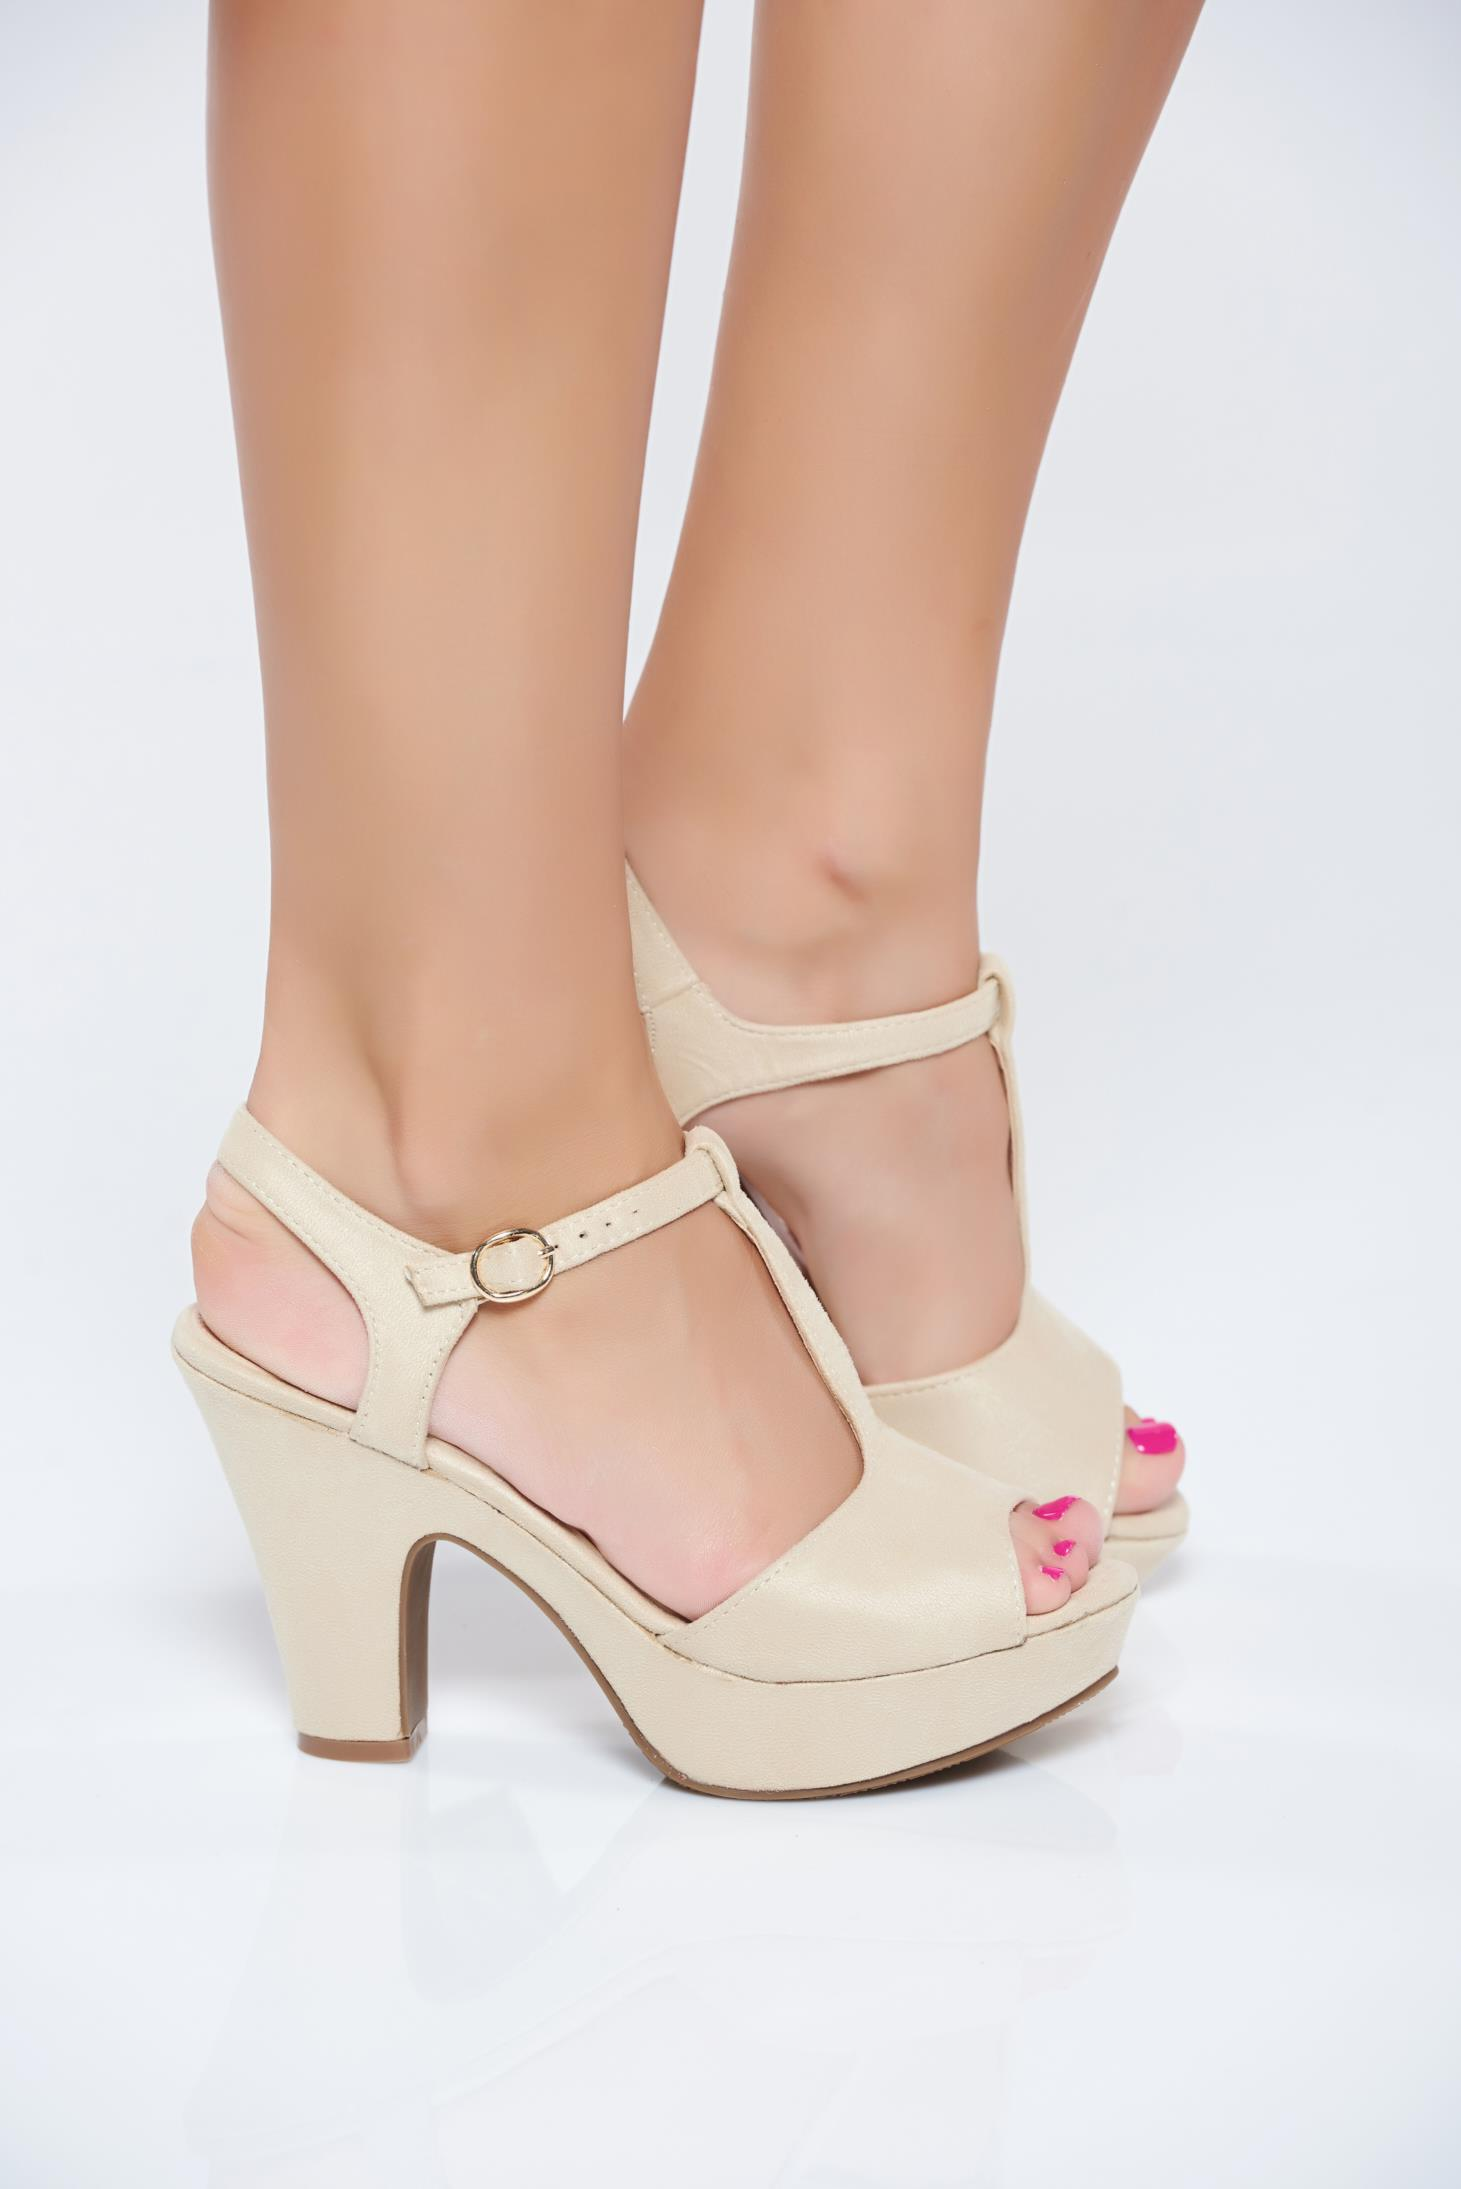 Cream heels high heels Cream Sandales thin straps 8e02cf